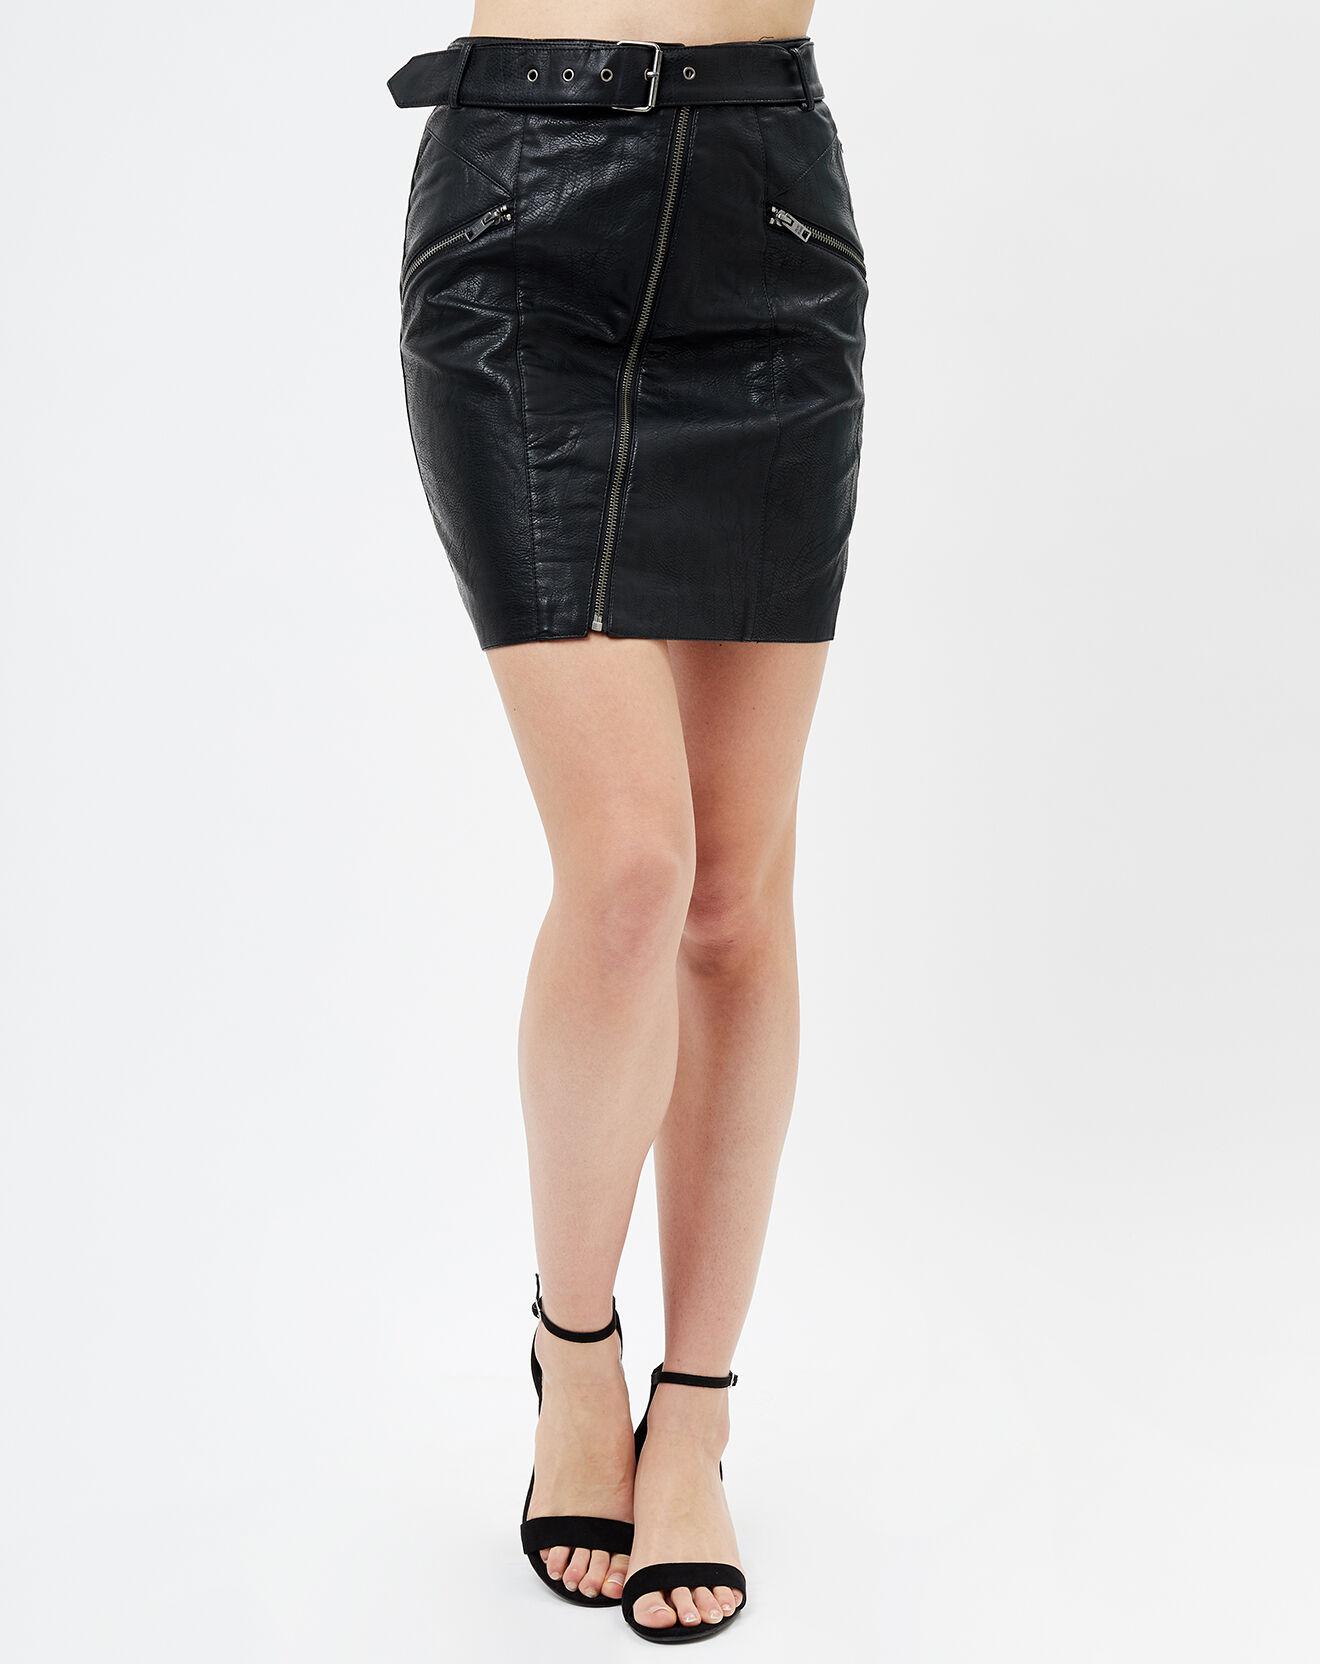 Jupe droite noire - Pepe Jeans - Modalova